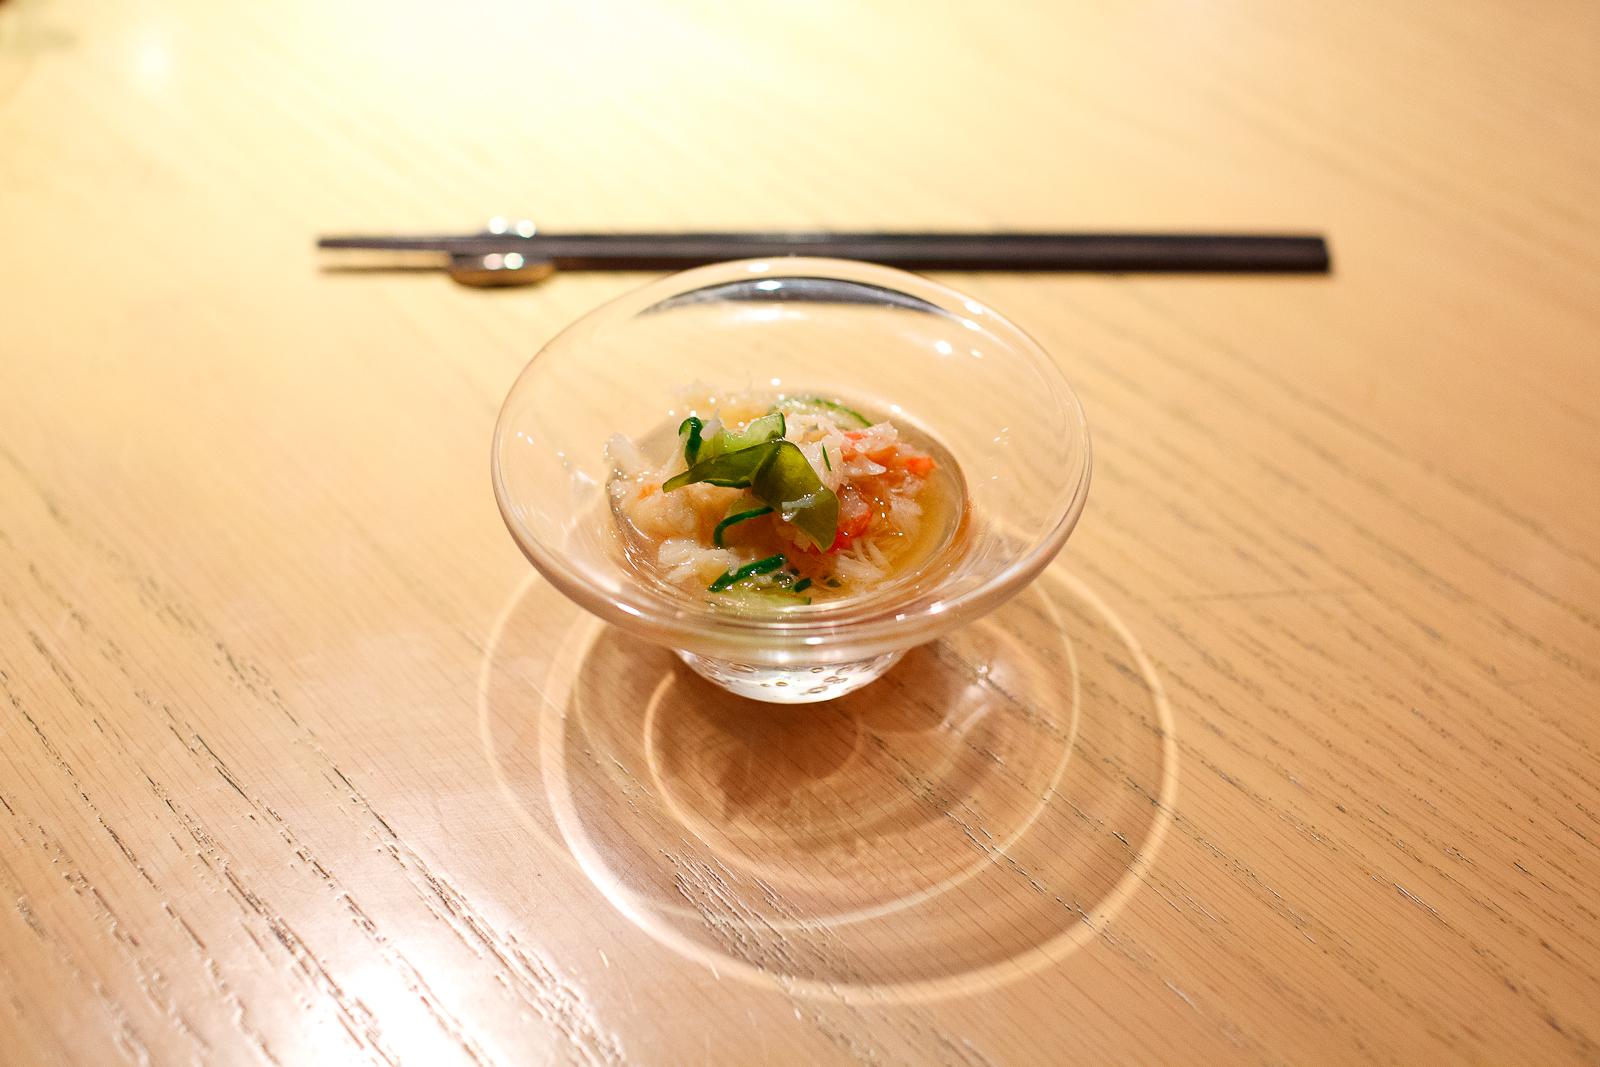 6th Course: Sumomomo - Snow crab and cucumber